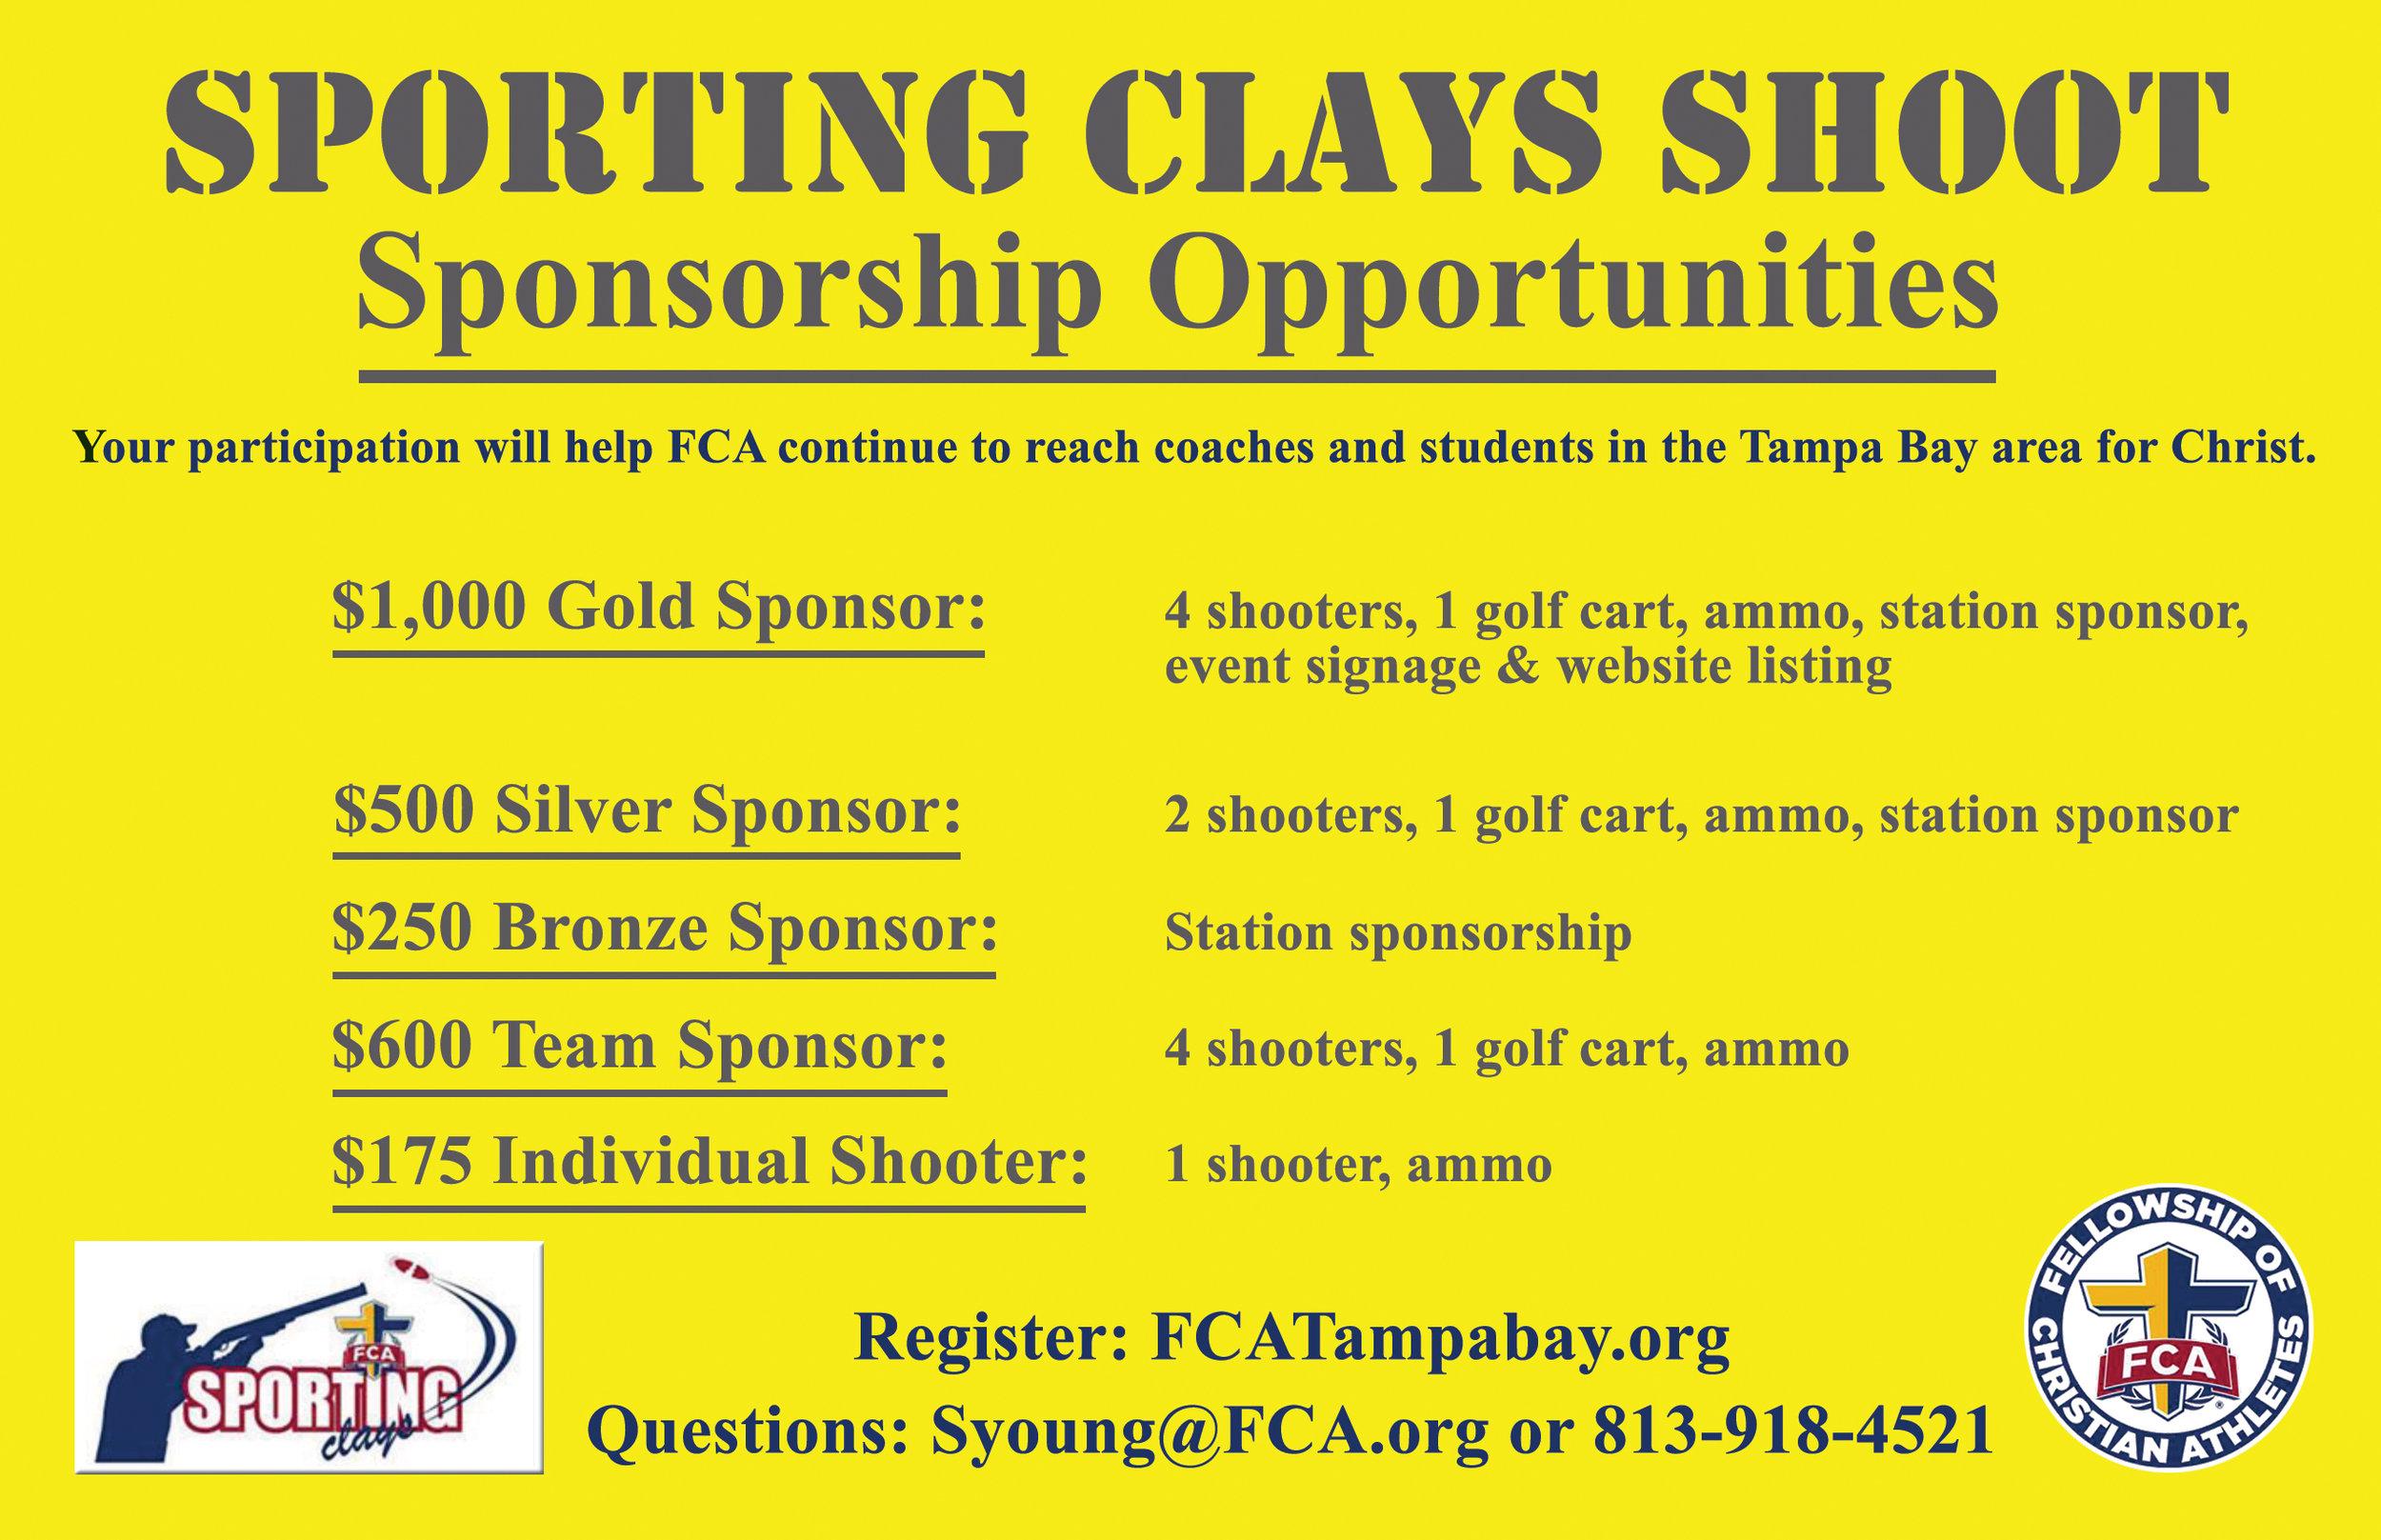 2019 Clay Shoot Flyer - 2.jpg